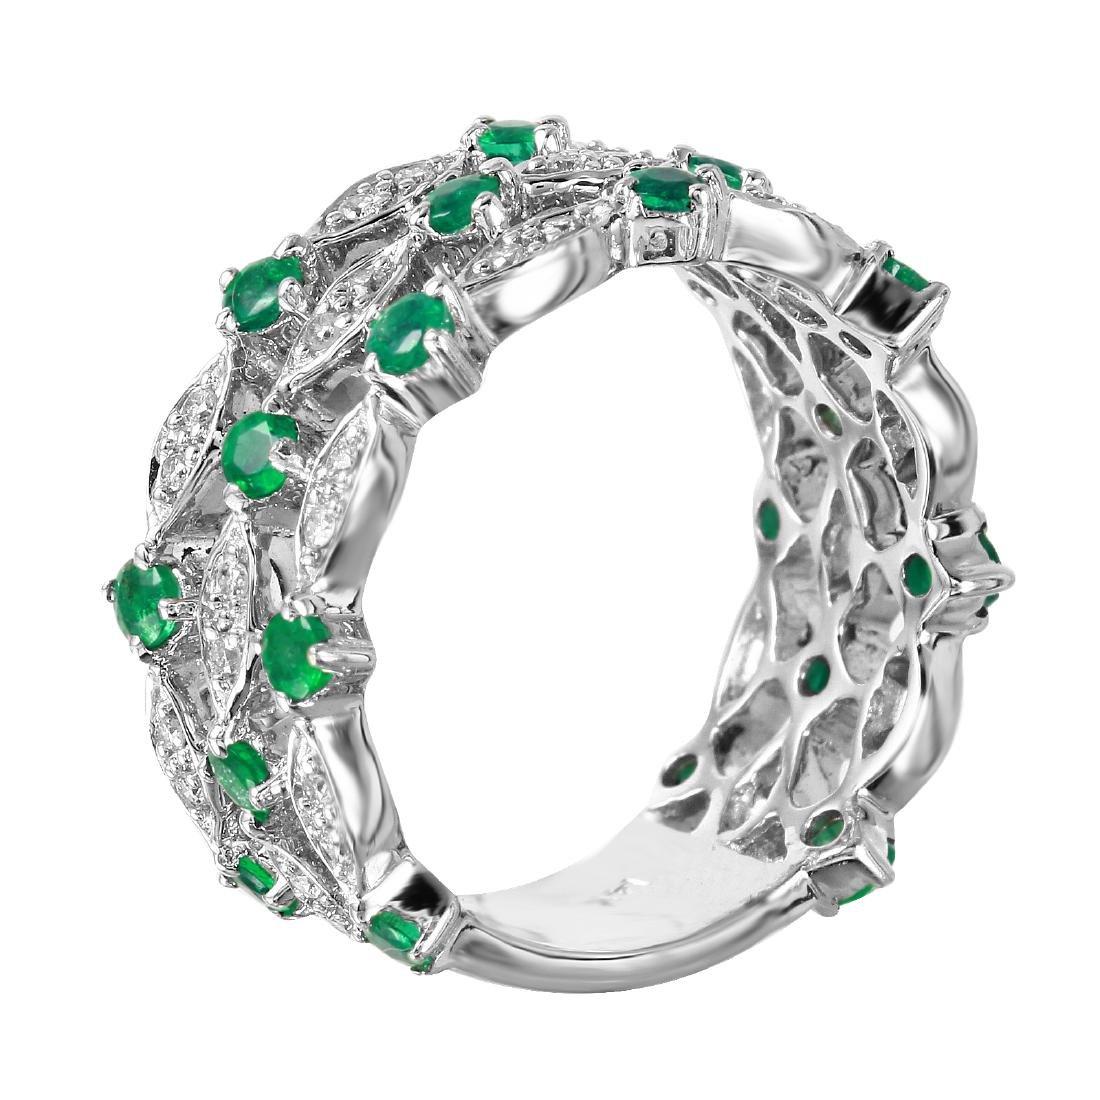 14KT White Gold 1.25ctw Emerald Diamond Ring Size 6.25 - 3